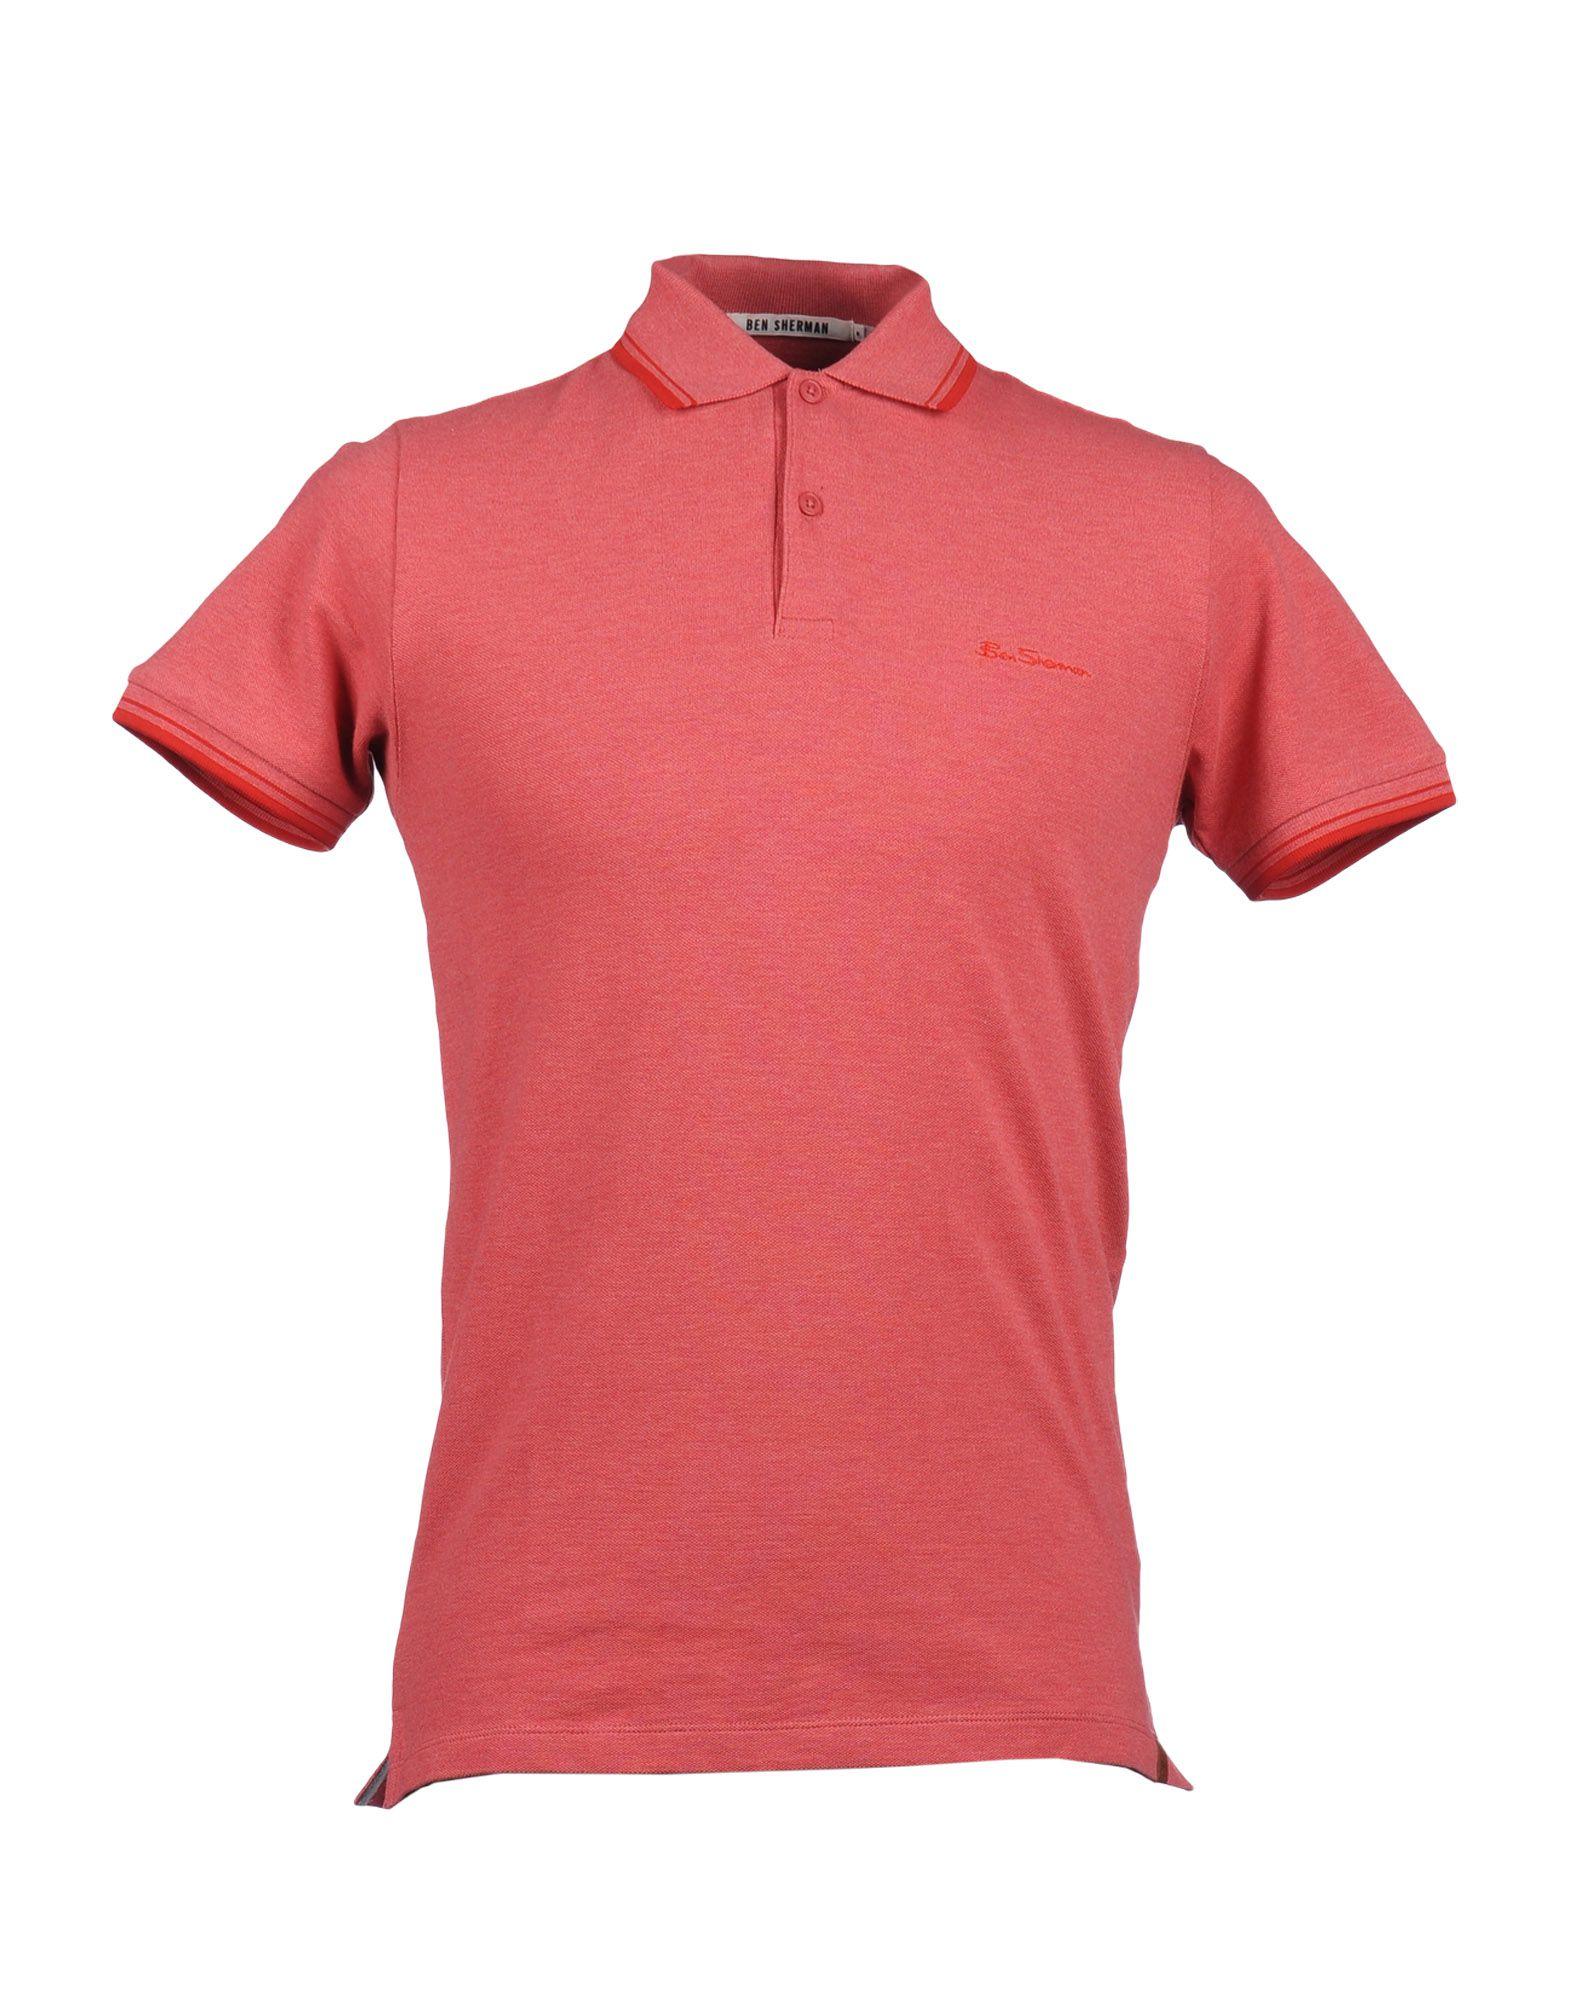 ben sherman polo shirt in pink for men coral lyst. Black Bedroom Furniture Sets. Home Design Ideas